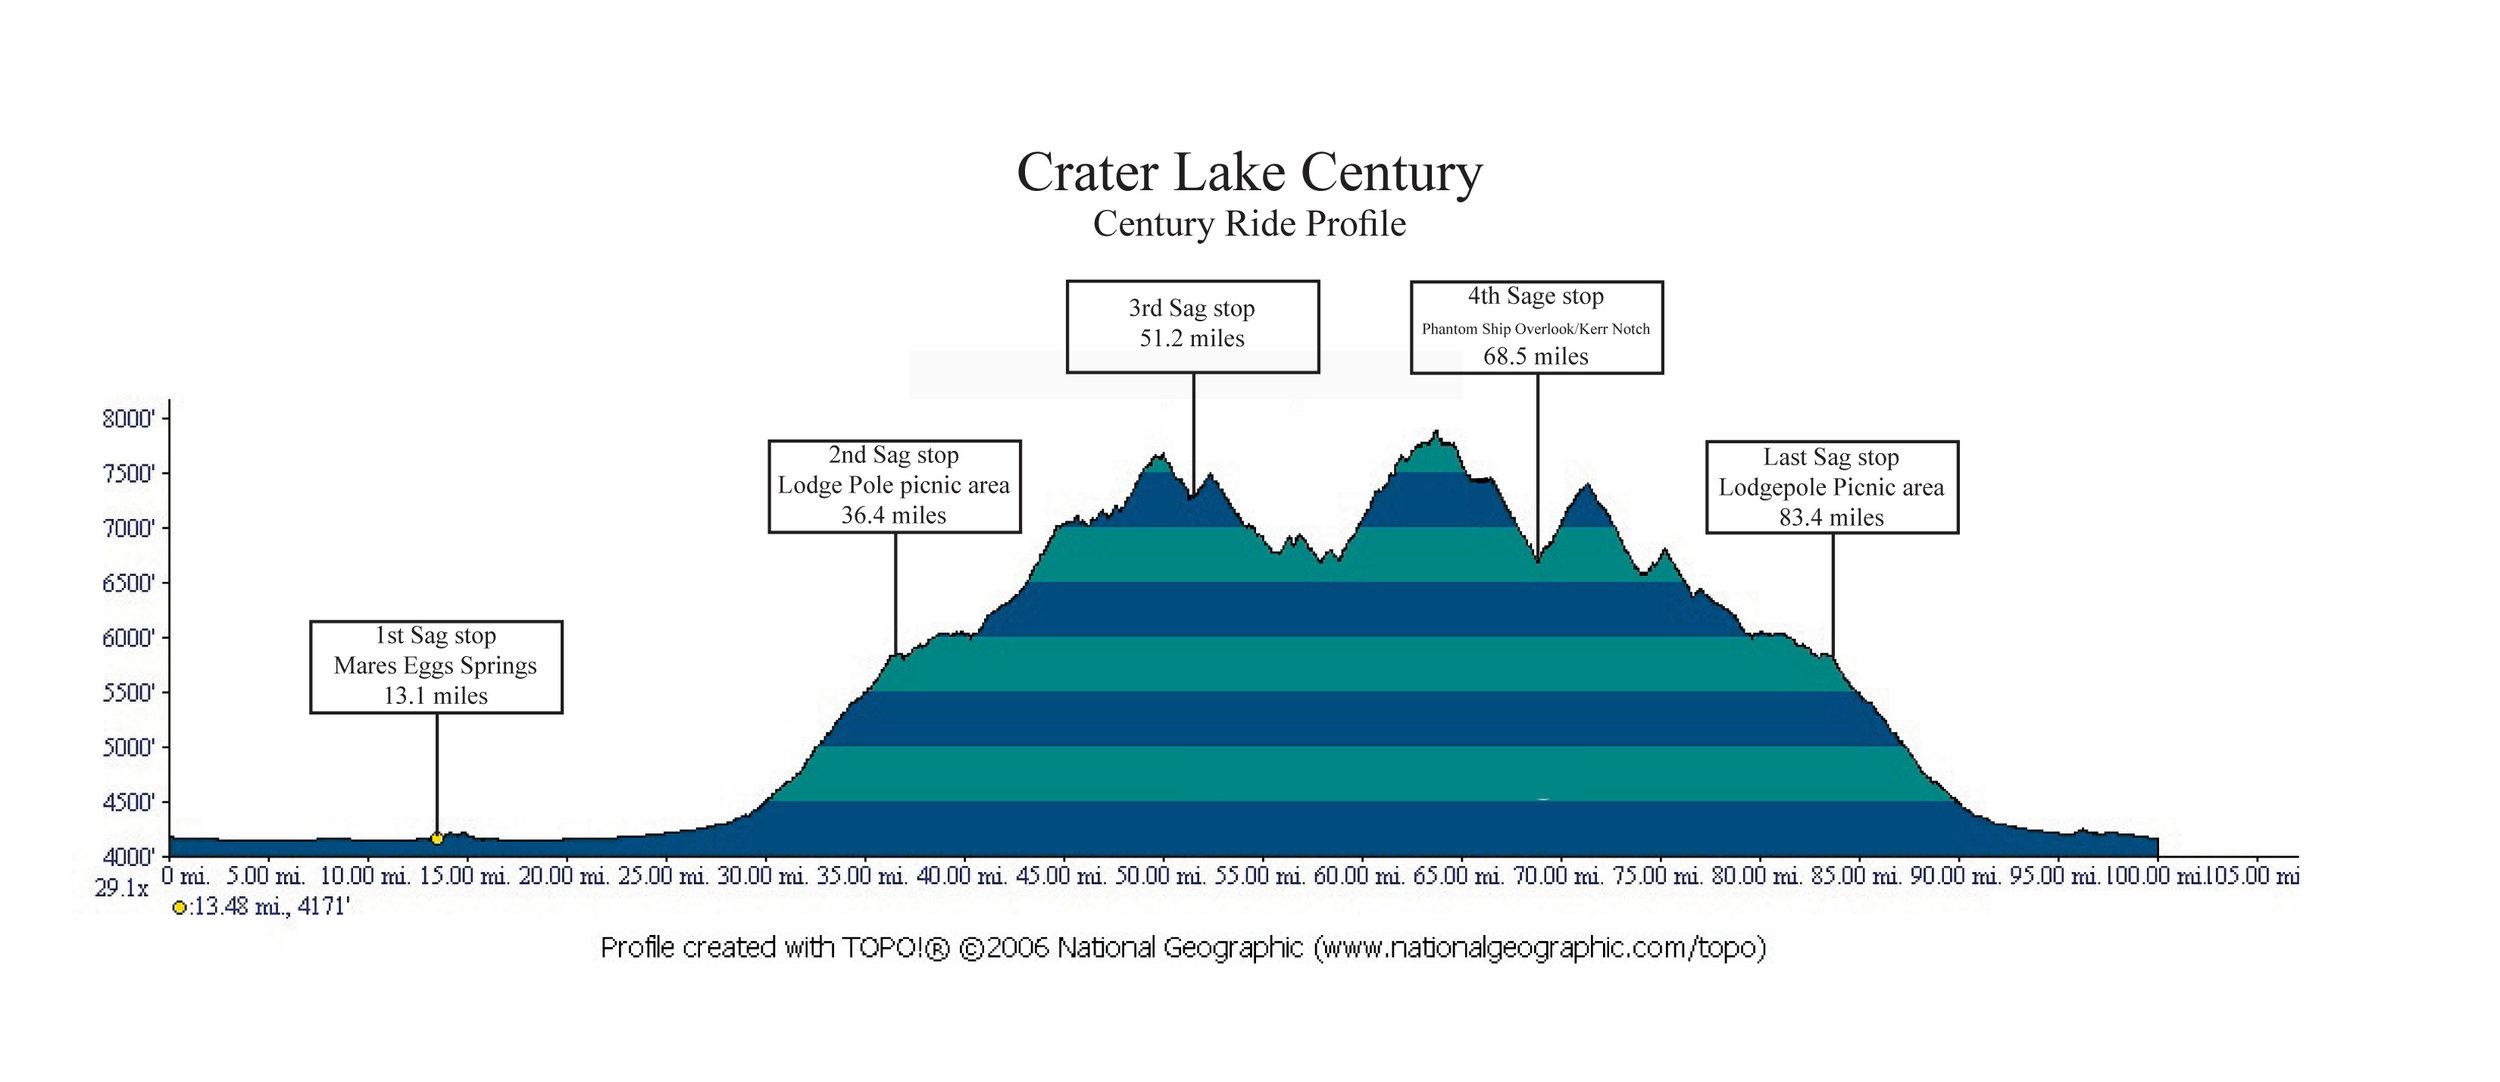 Century Ride Profile